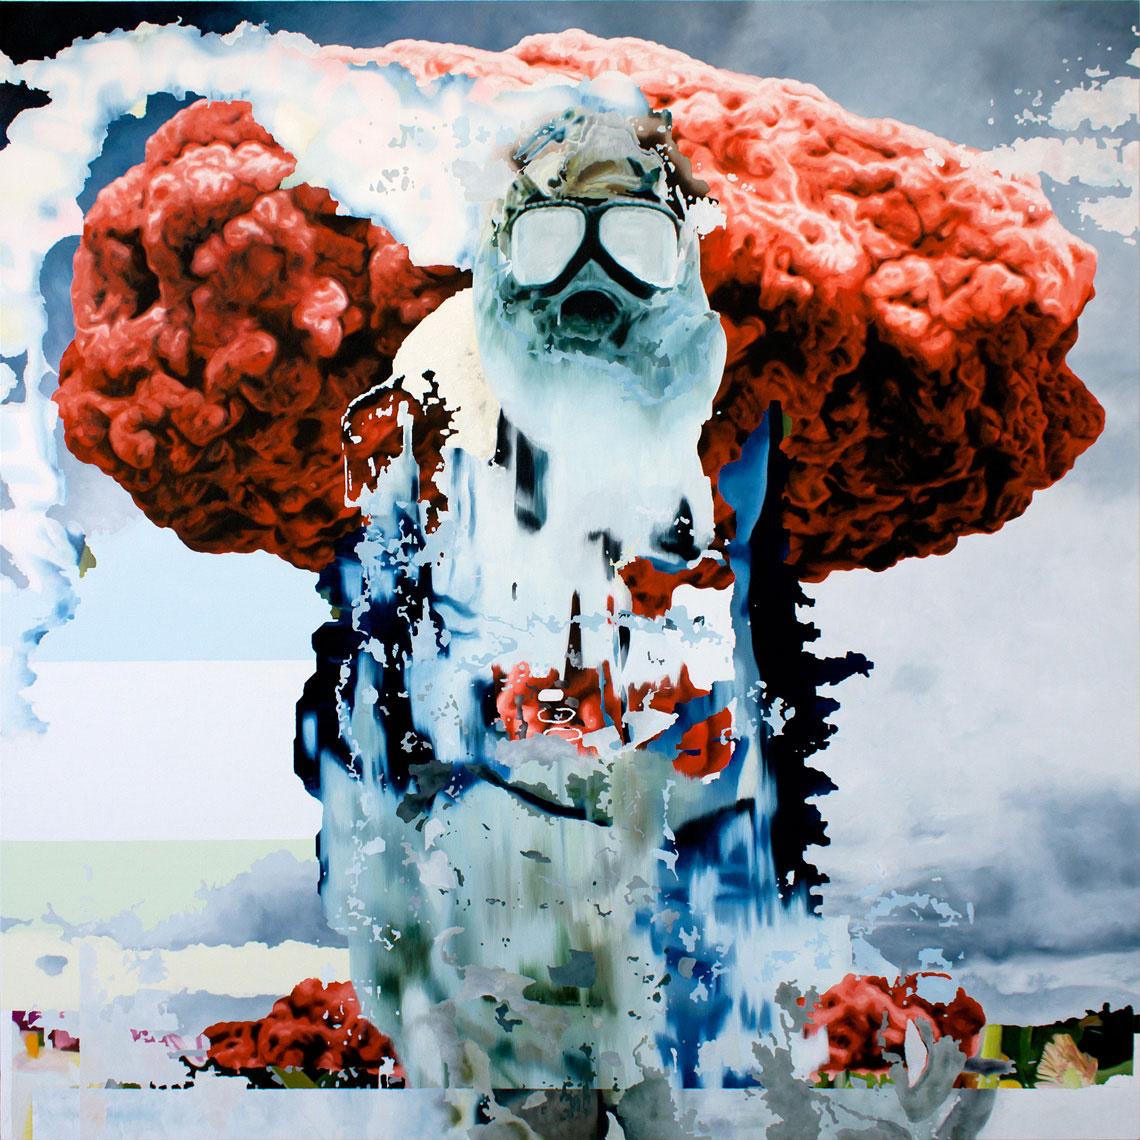 Atomic bom painted by Roberto López